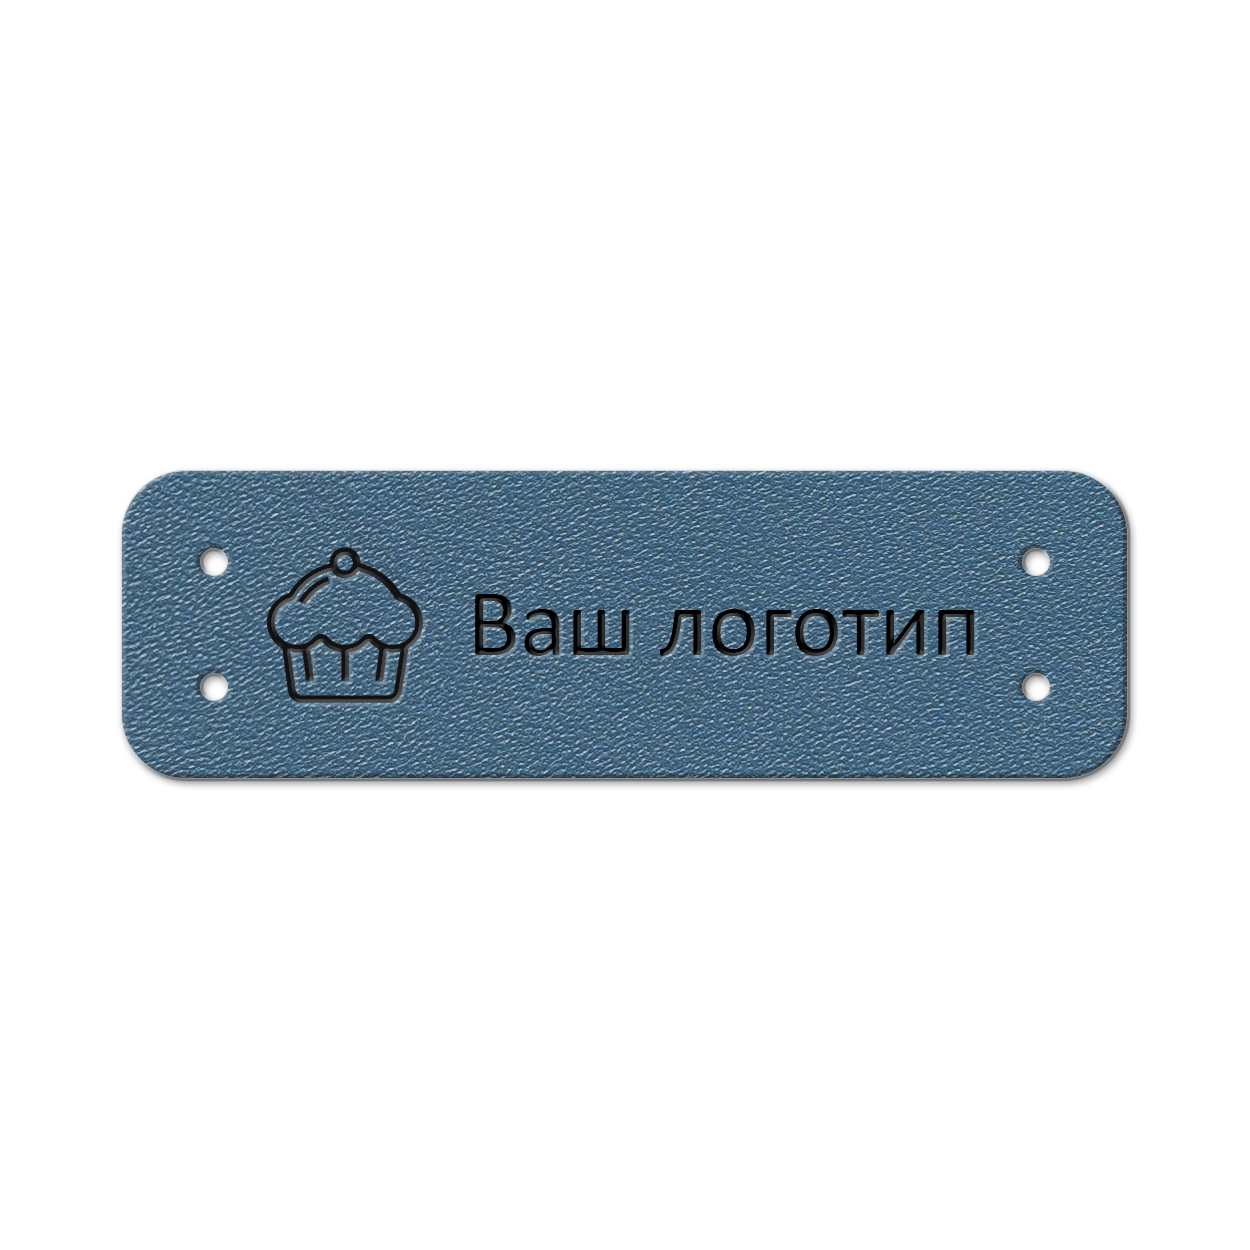 Бирка пришивная 1,2 х 4 cм. 10 шт. Navy blue